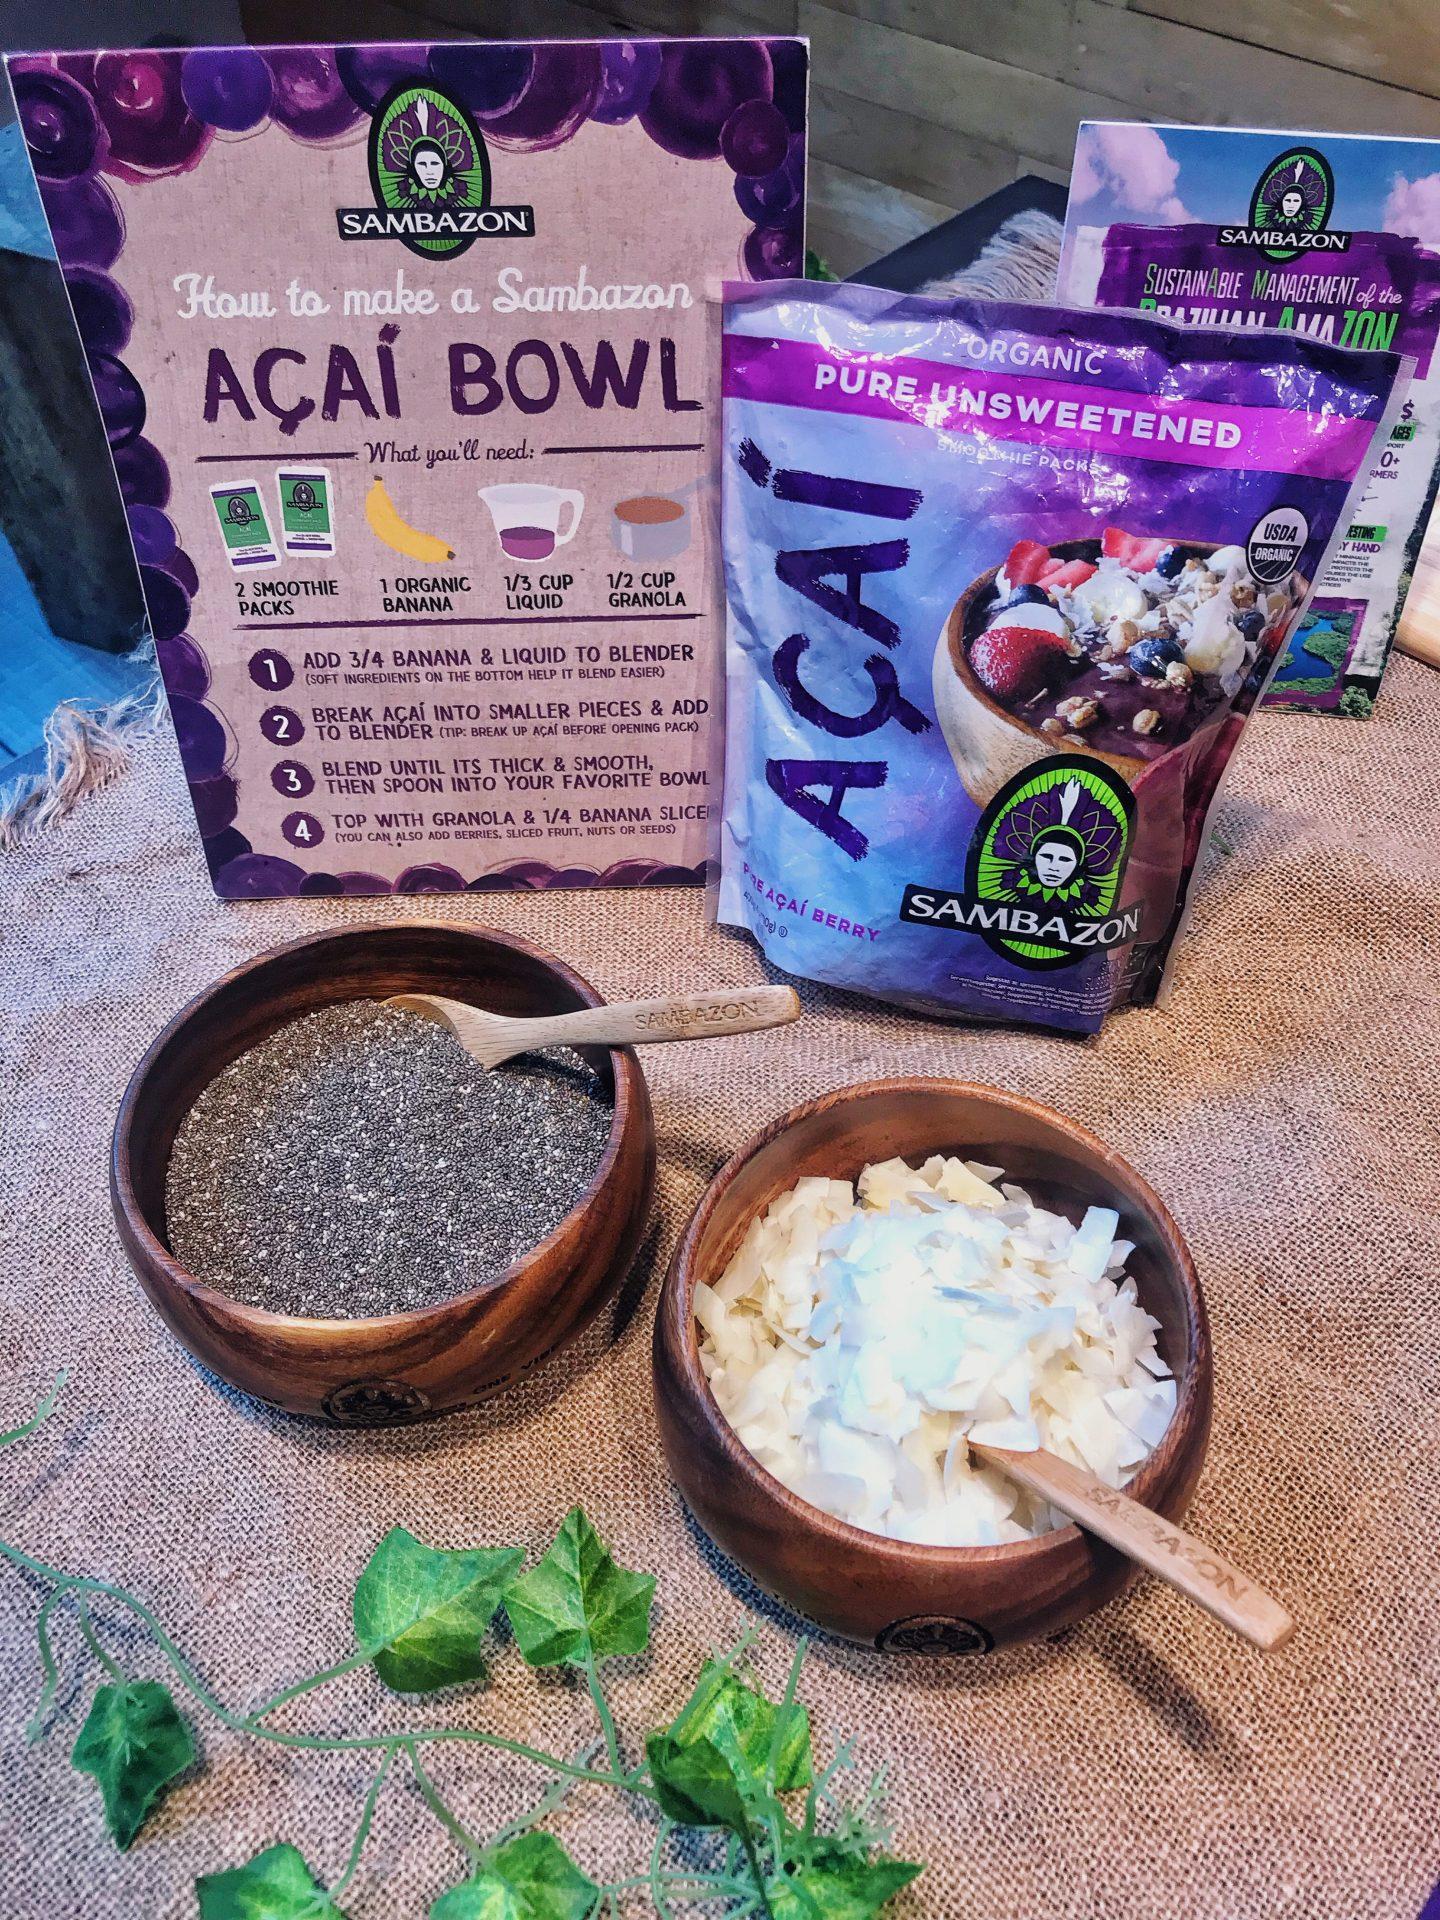 Sambazon Acai Bowl Masterclass at Whole Foods